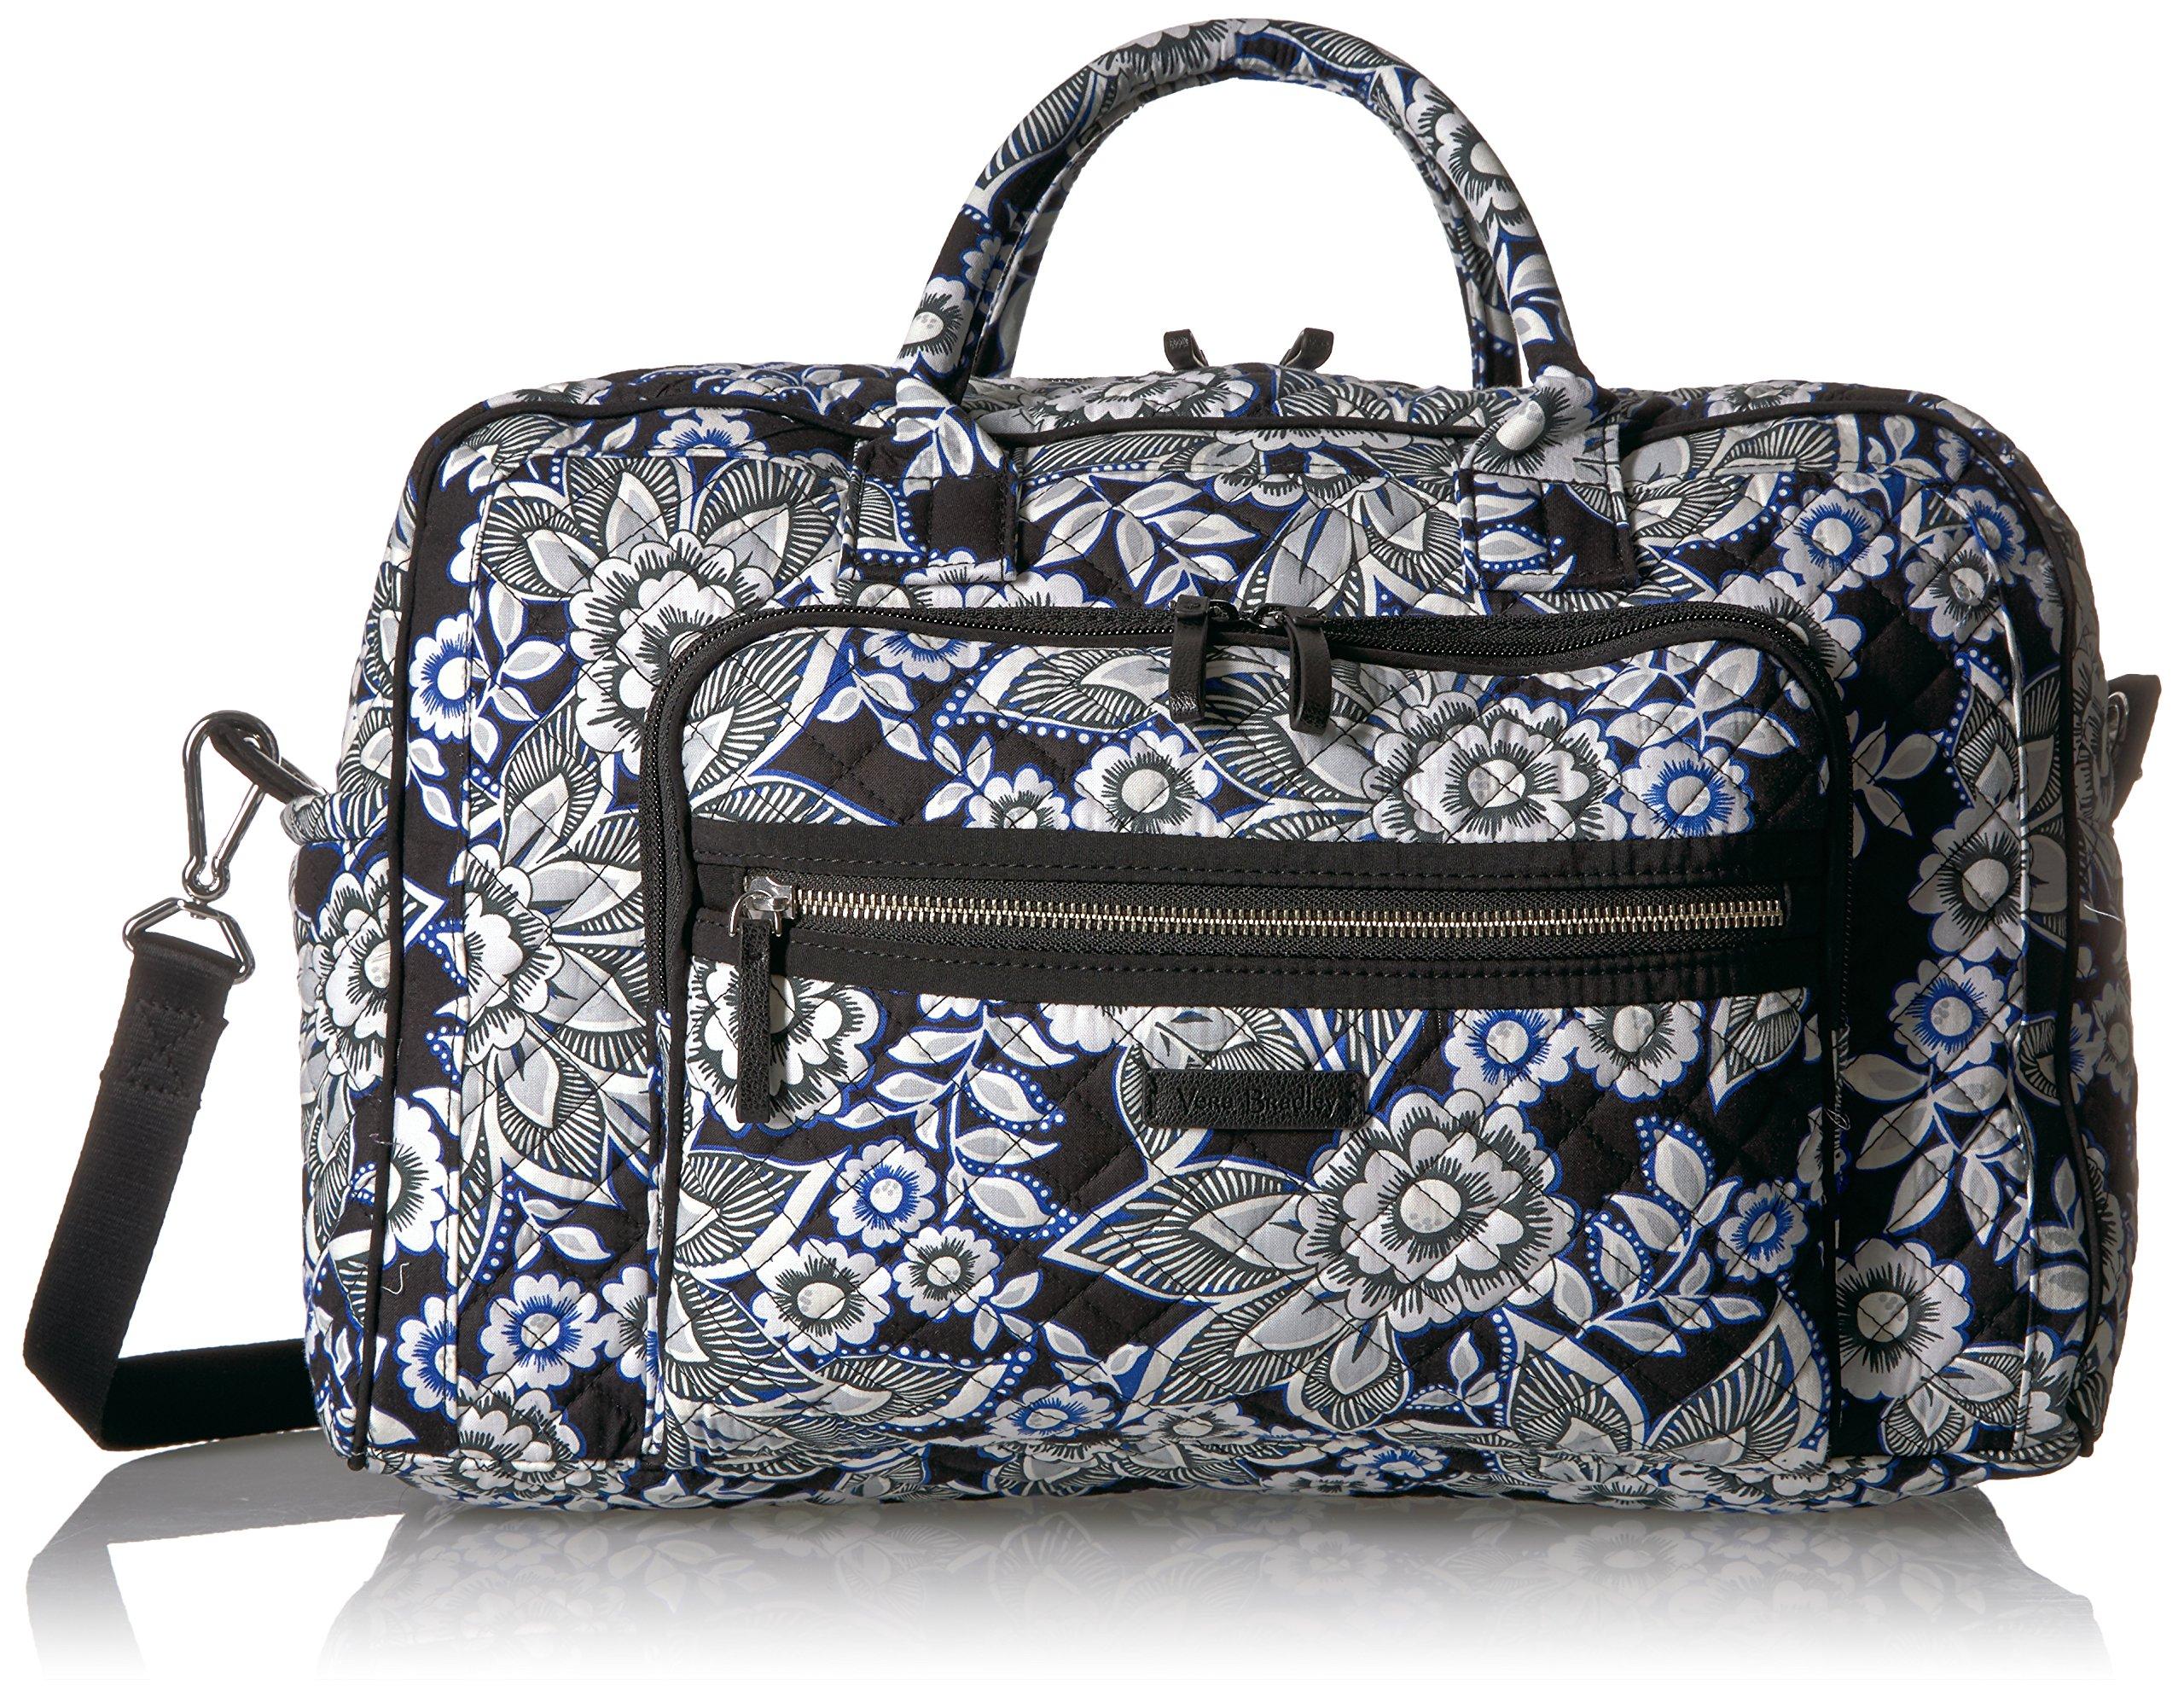 Vera Bradley Women's Iconic Compact Weekender Travel Bag-Signature, Snow Lotus